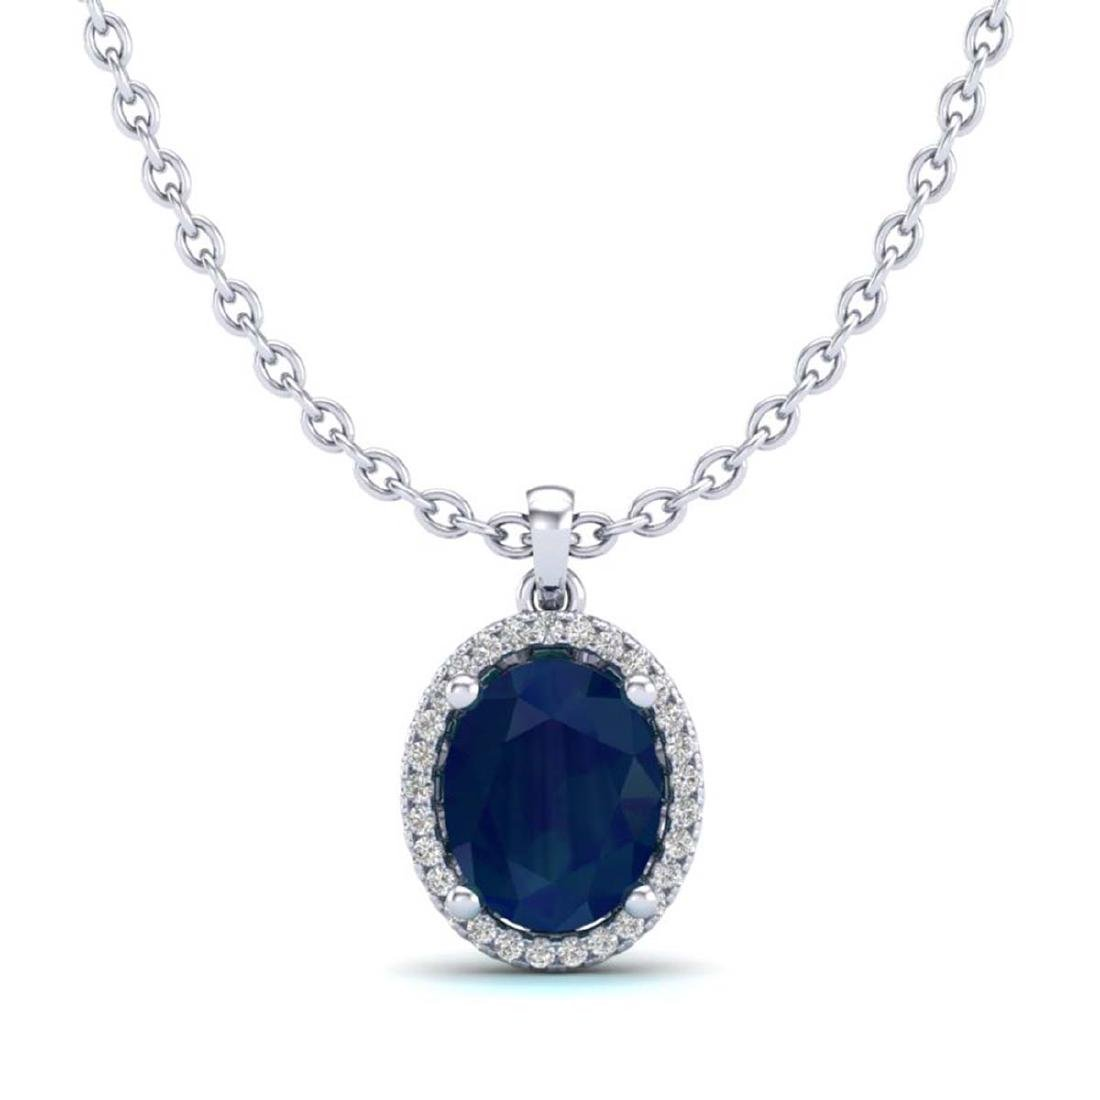 3 CTW Sapphire & VS/SI Diamond Necklace Halo 18K Gold - - 2